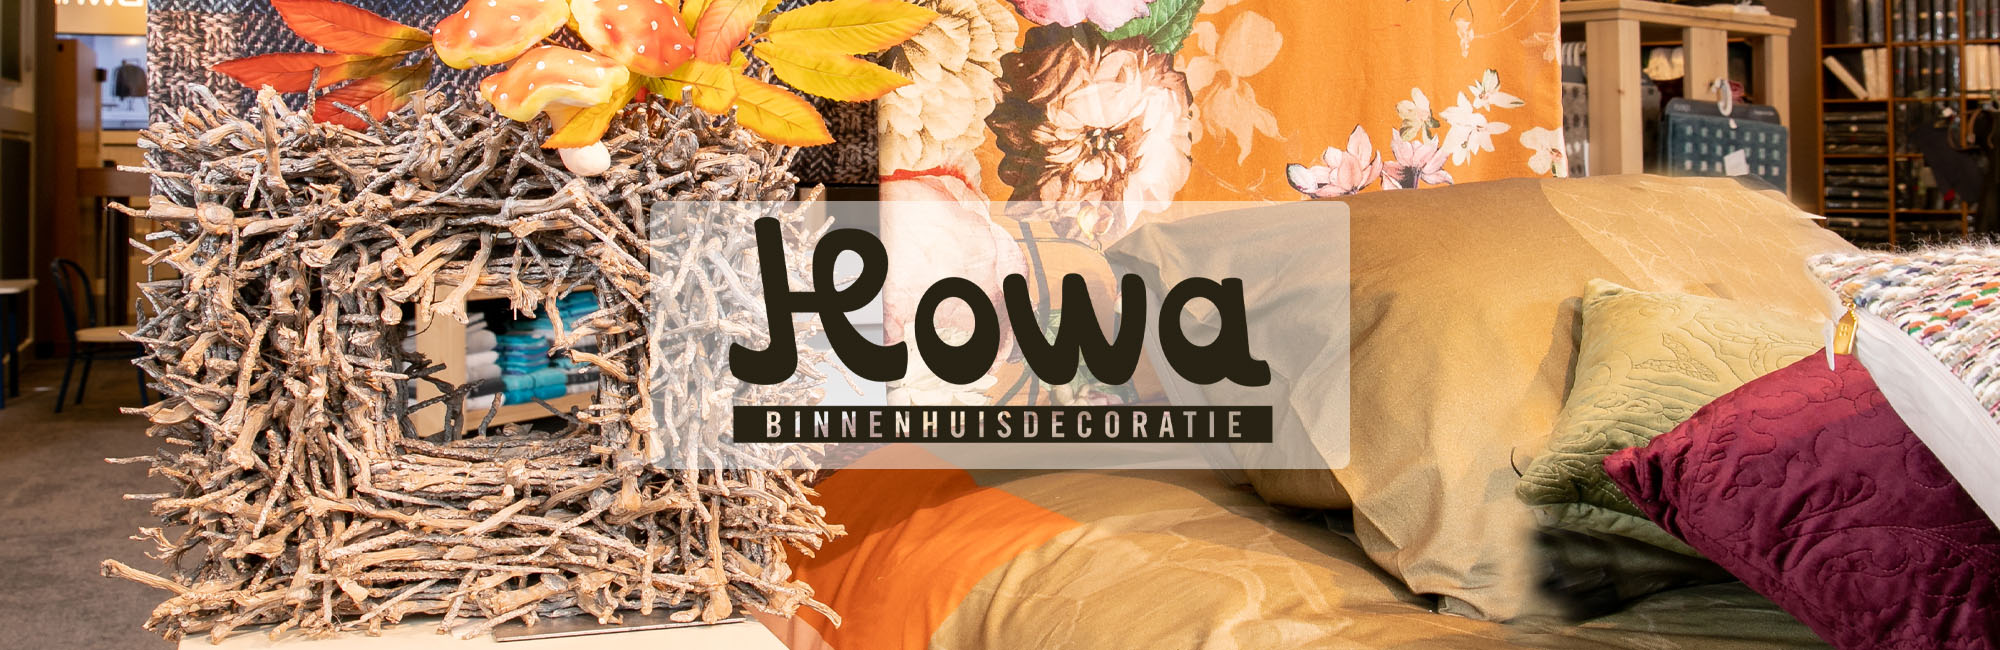 Laminaat tapijt vinyl pvc howa binnenhuis decoratie